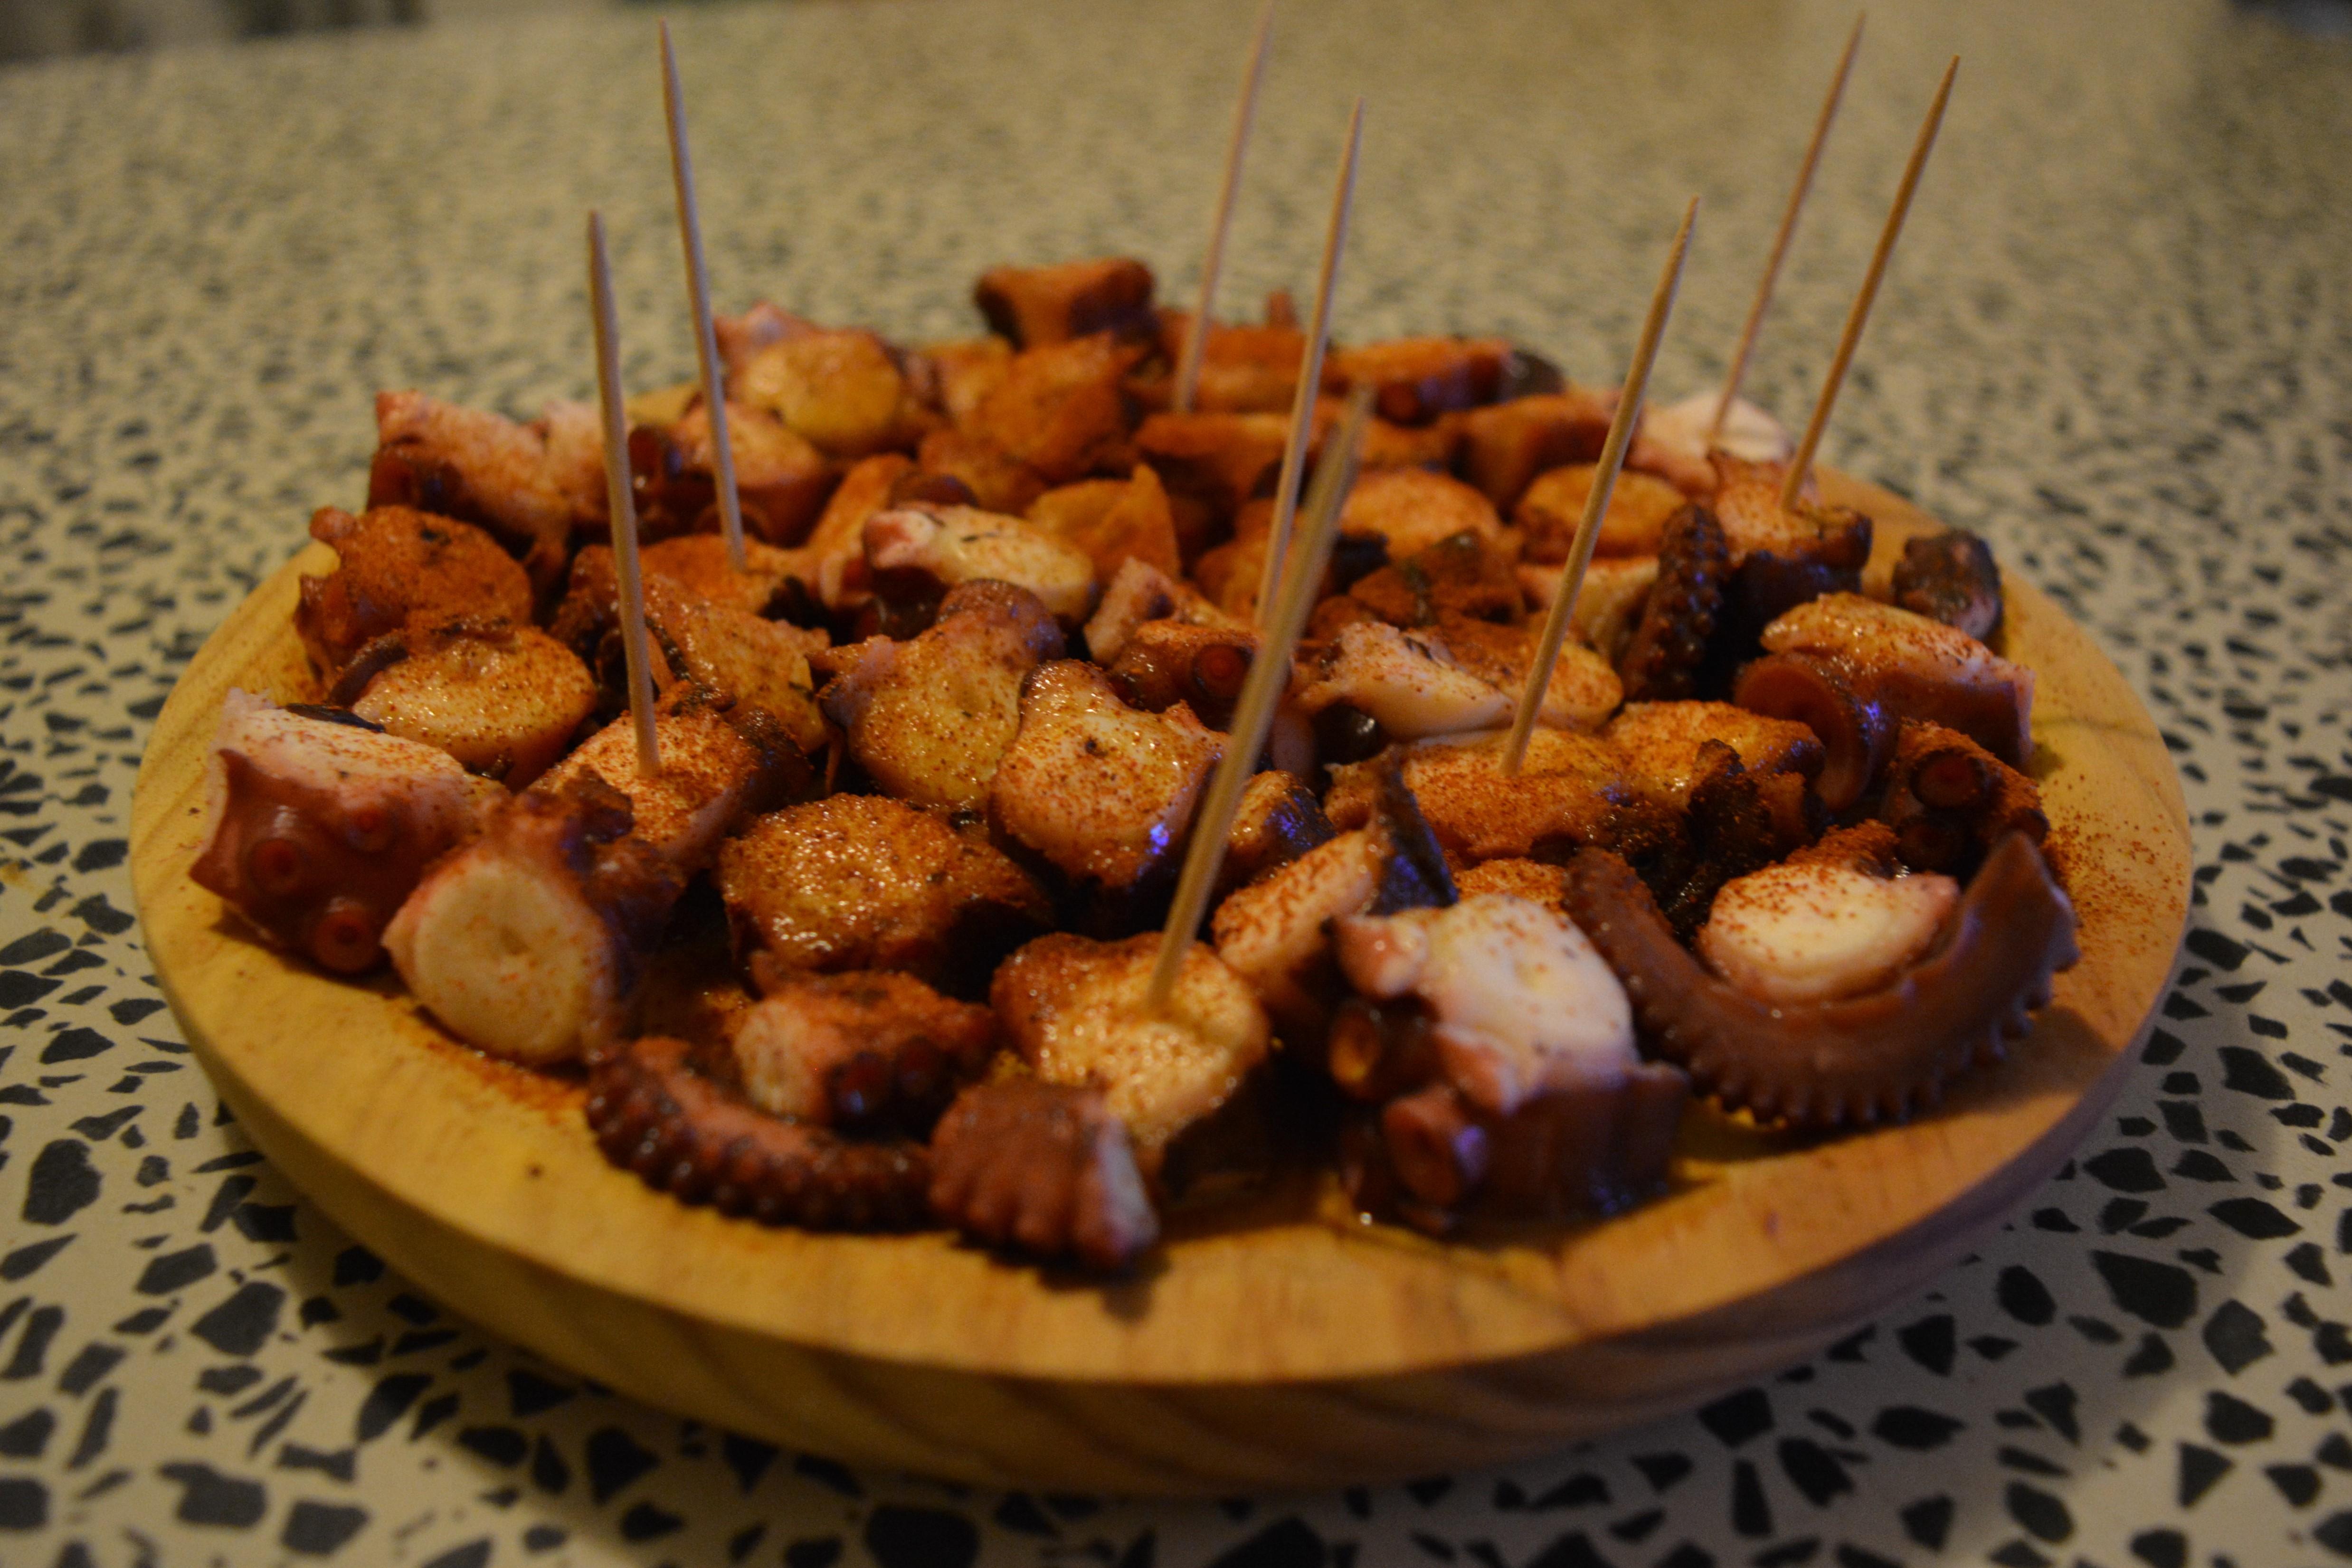 ricetta pulpo a la gallega 2 - aspassoperlaspagna.it